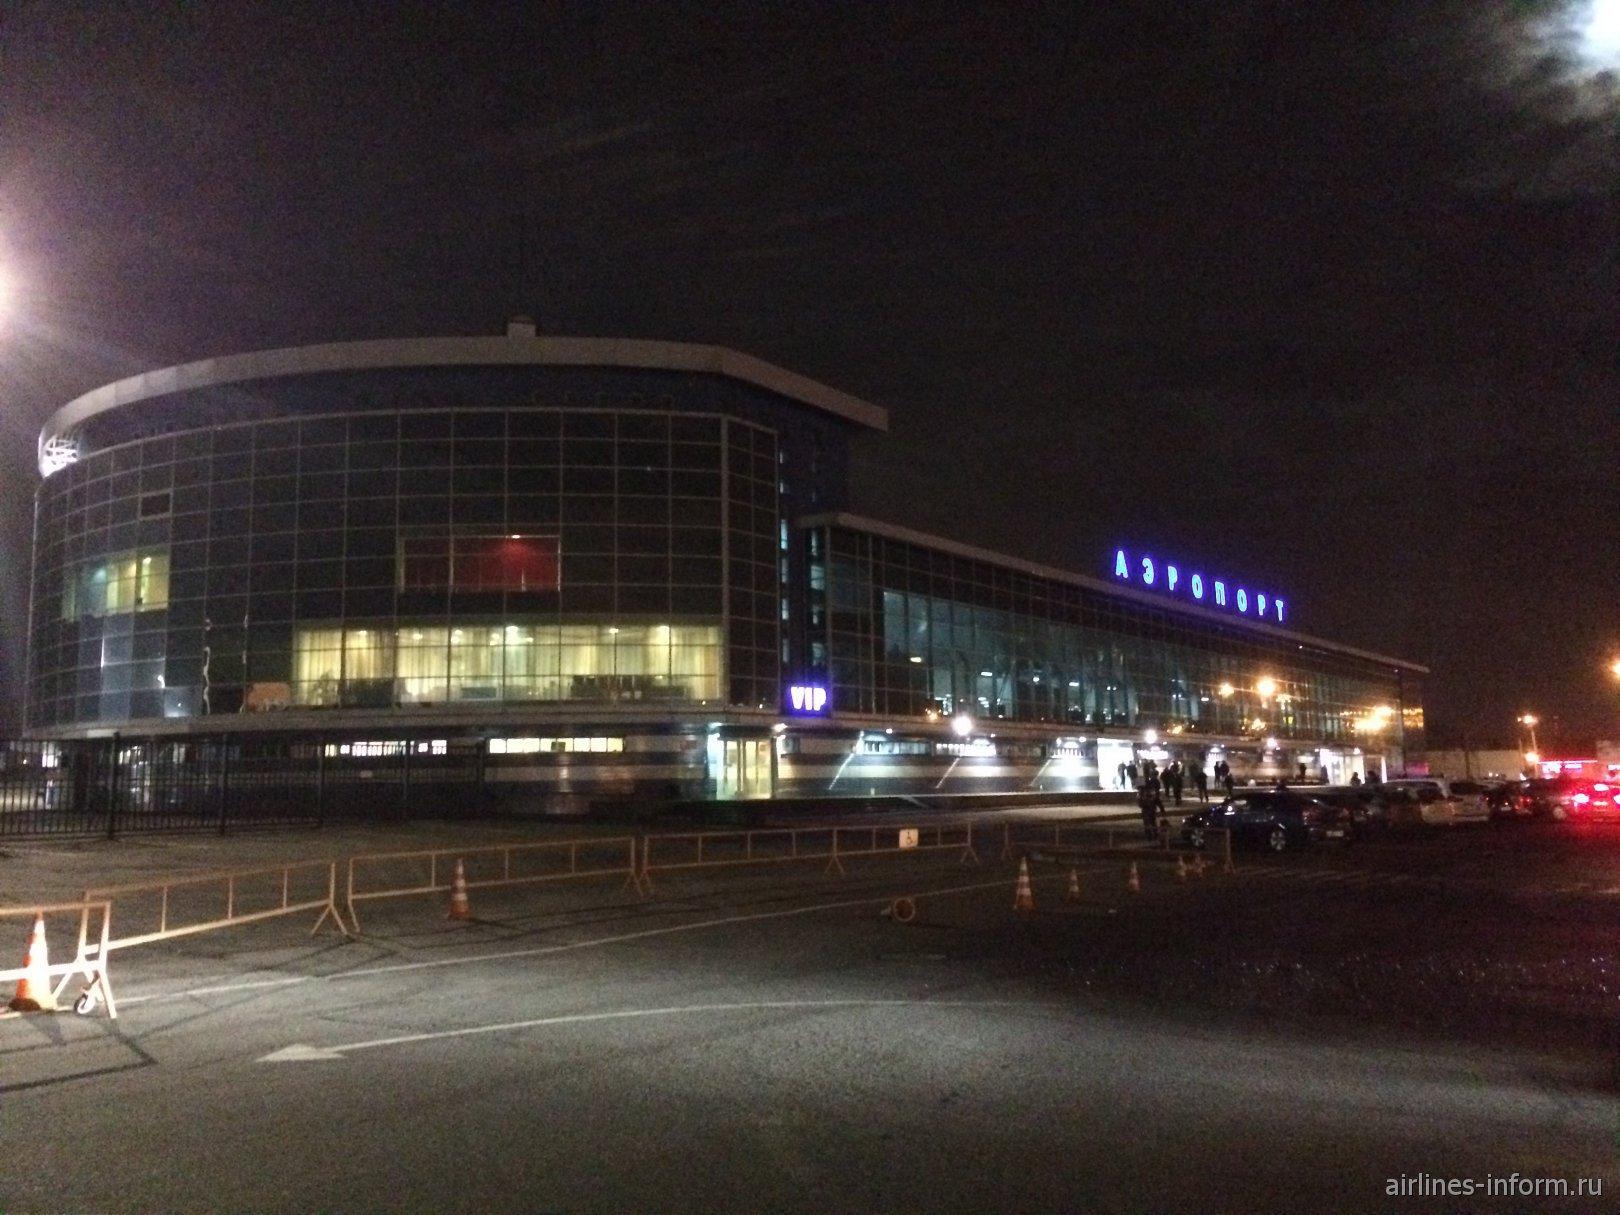 Терминал внутренних линий аэропорта Иркутск